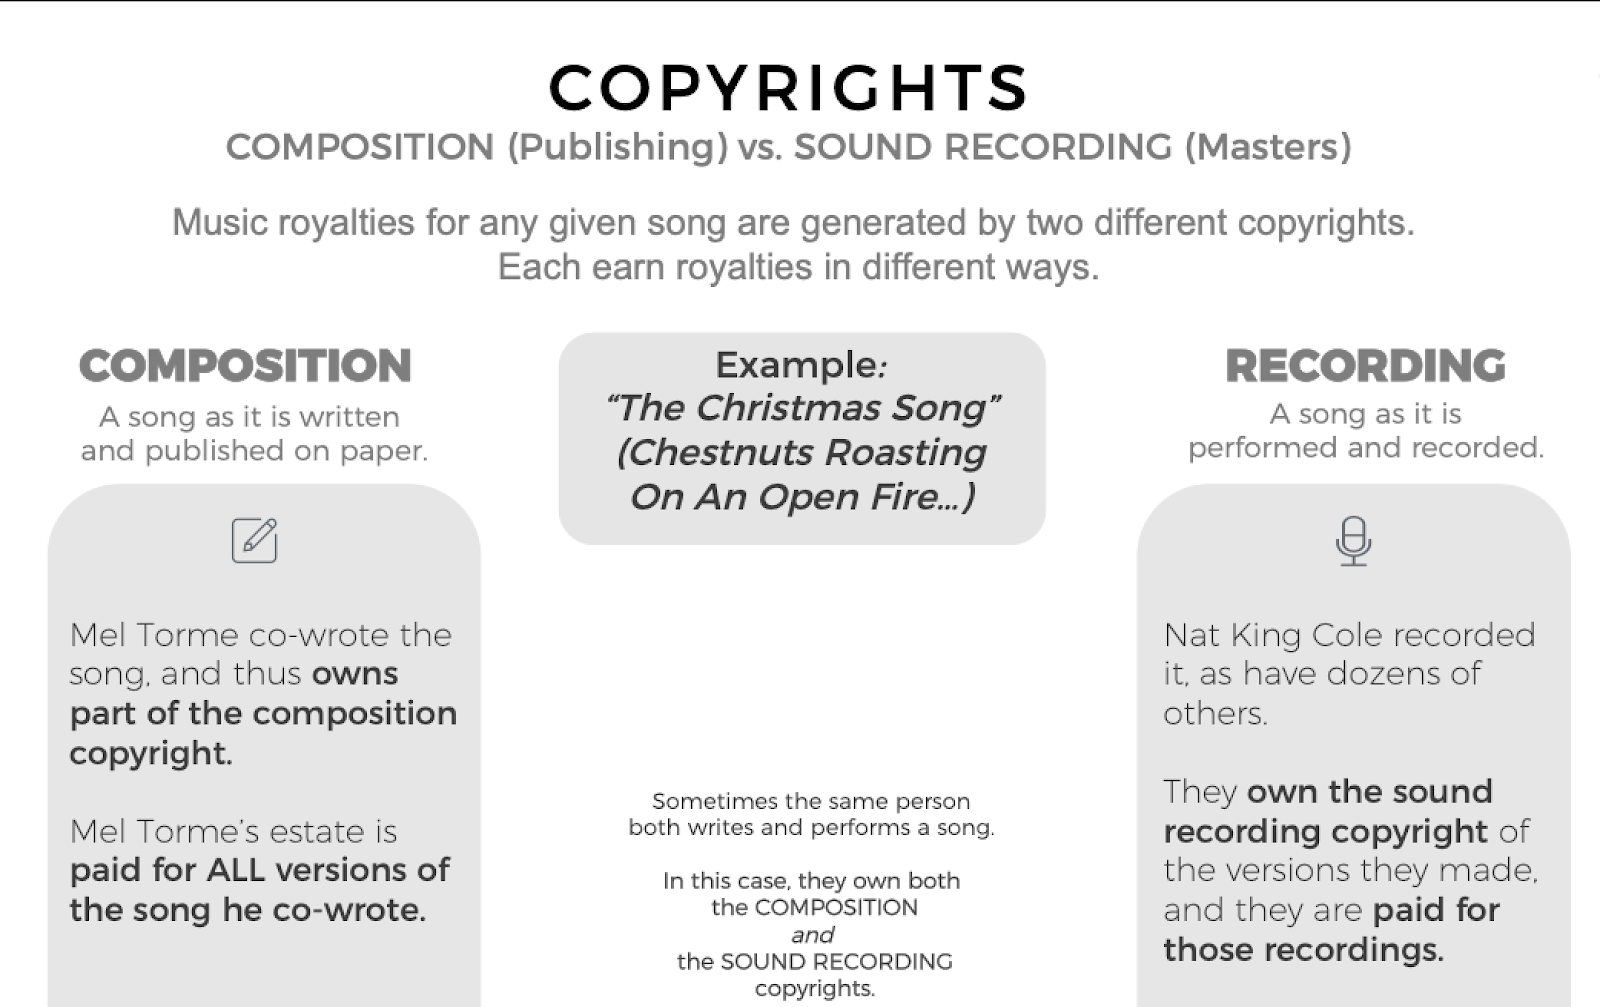 Composition vs. Recording Copyrights